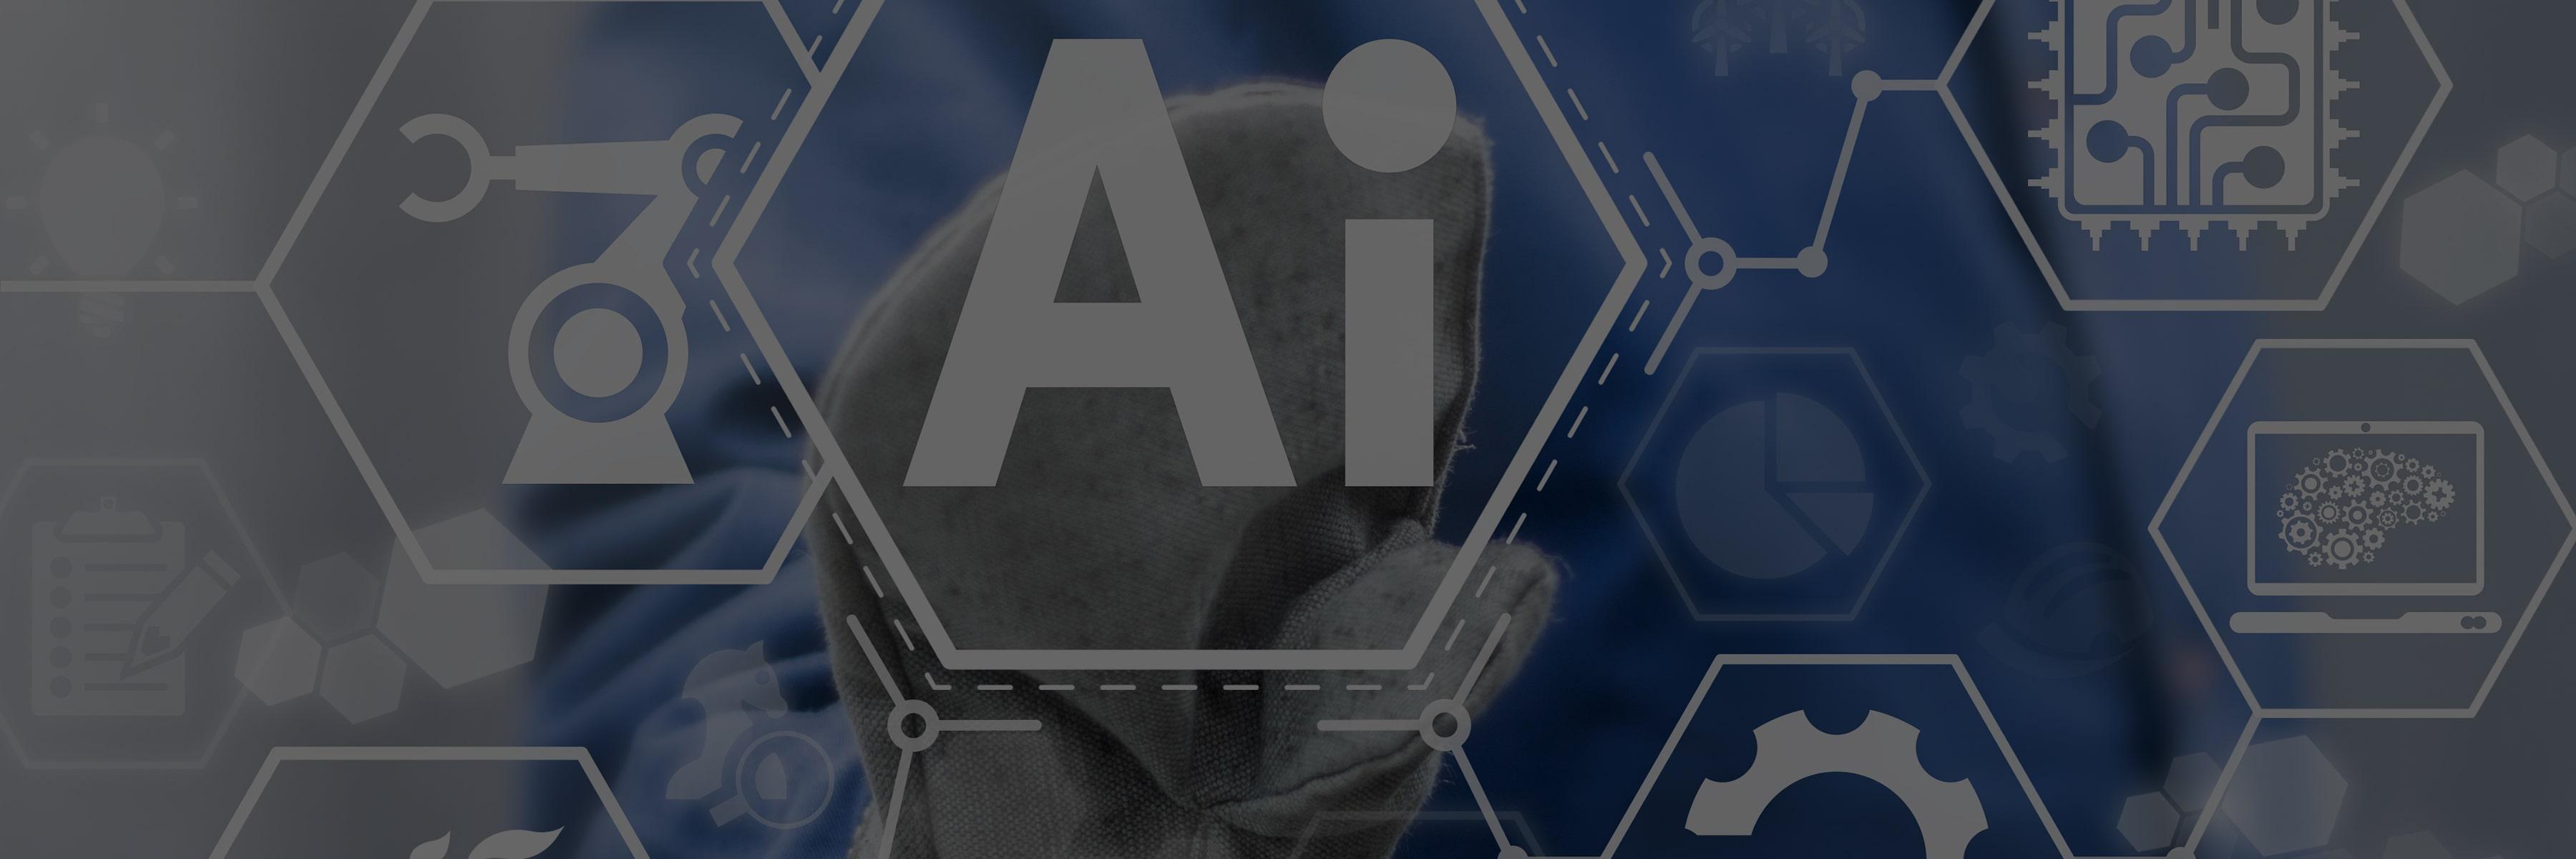 naem-2021-webinar-banner-use-of-artificial-intelligence-ai-to-facilitate-ehs-audits-ehsai-1800x600